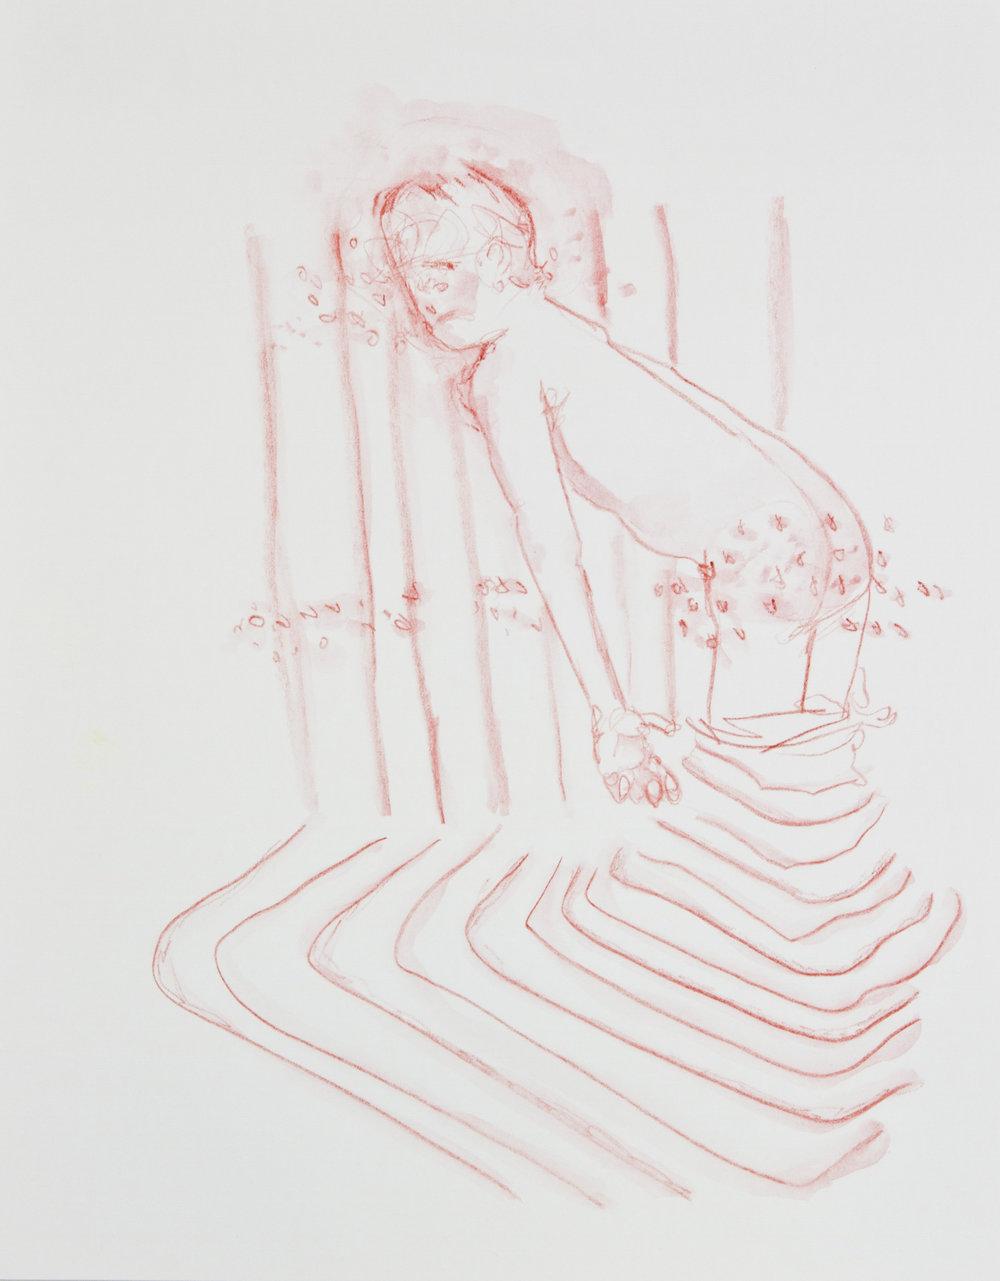 Quicksand Magic, 2013, watercolor pencil on paper, 11x14 inches